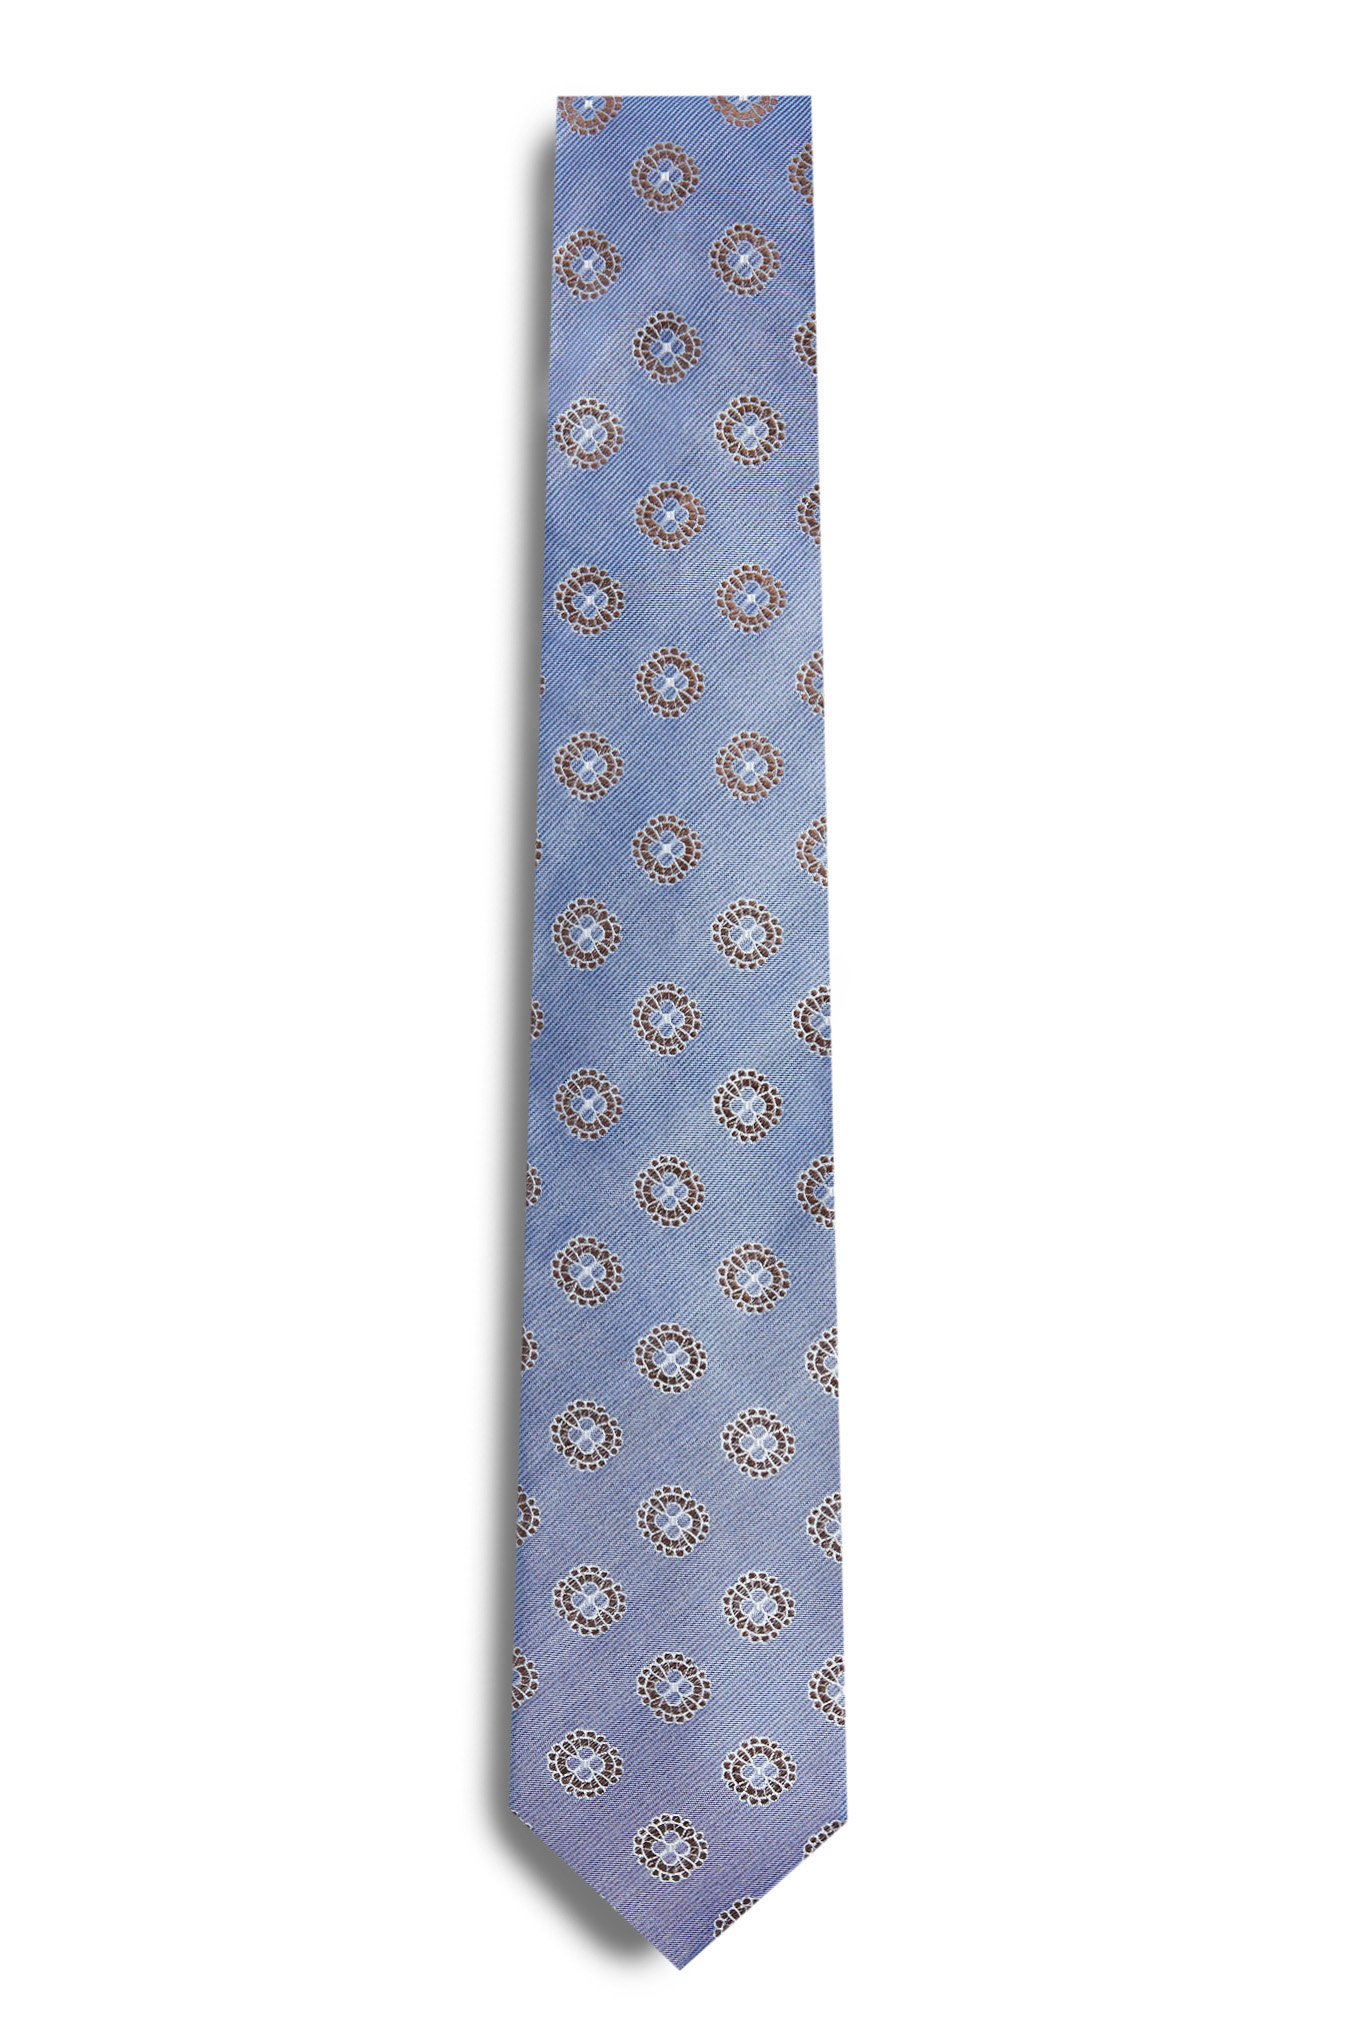 Tie Blue Formal Man